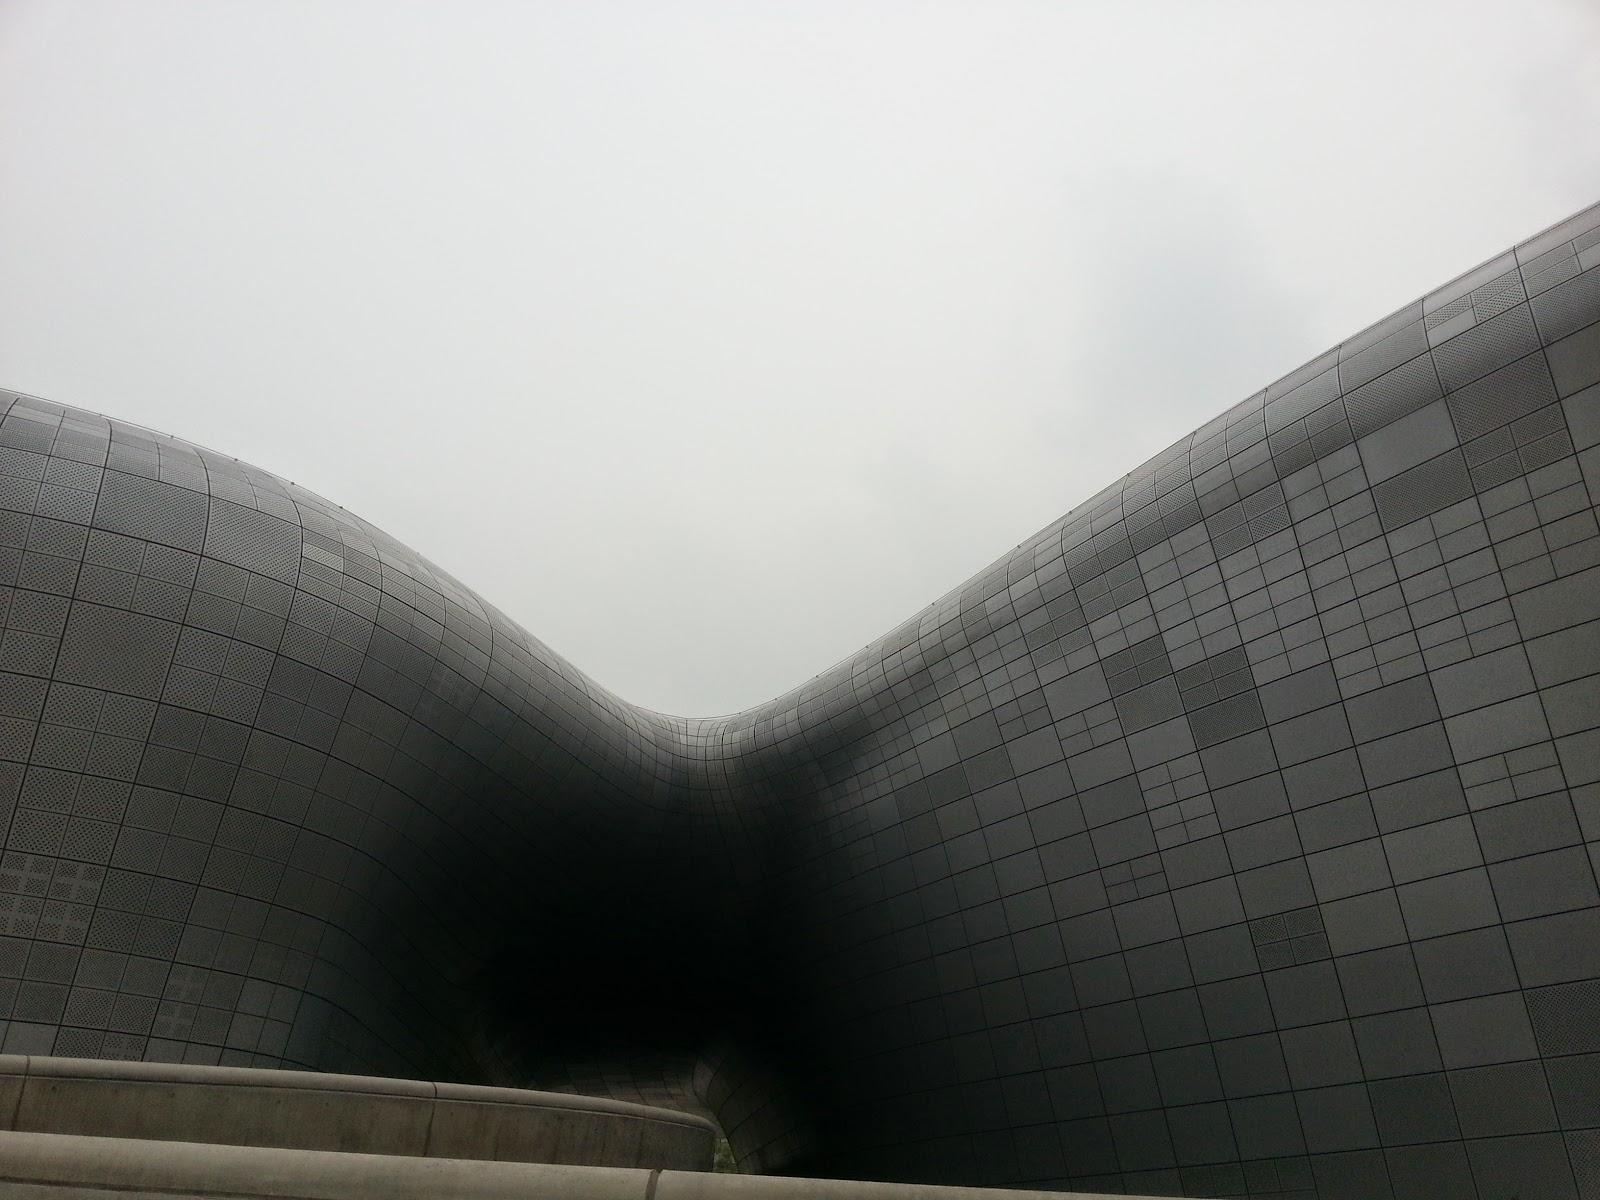 Curves of the Design plaza in Dongdaemun